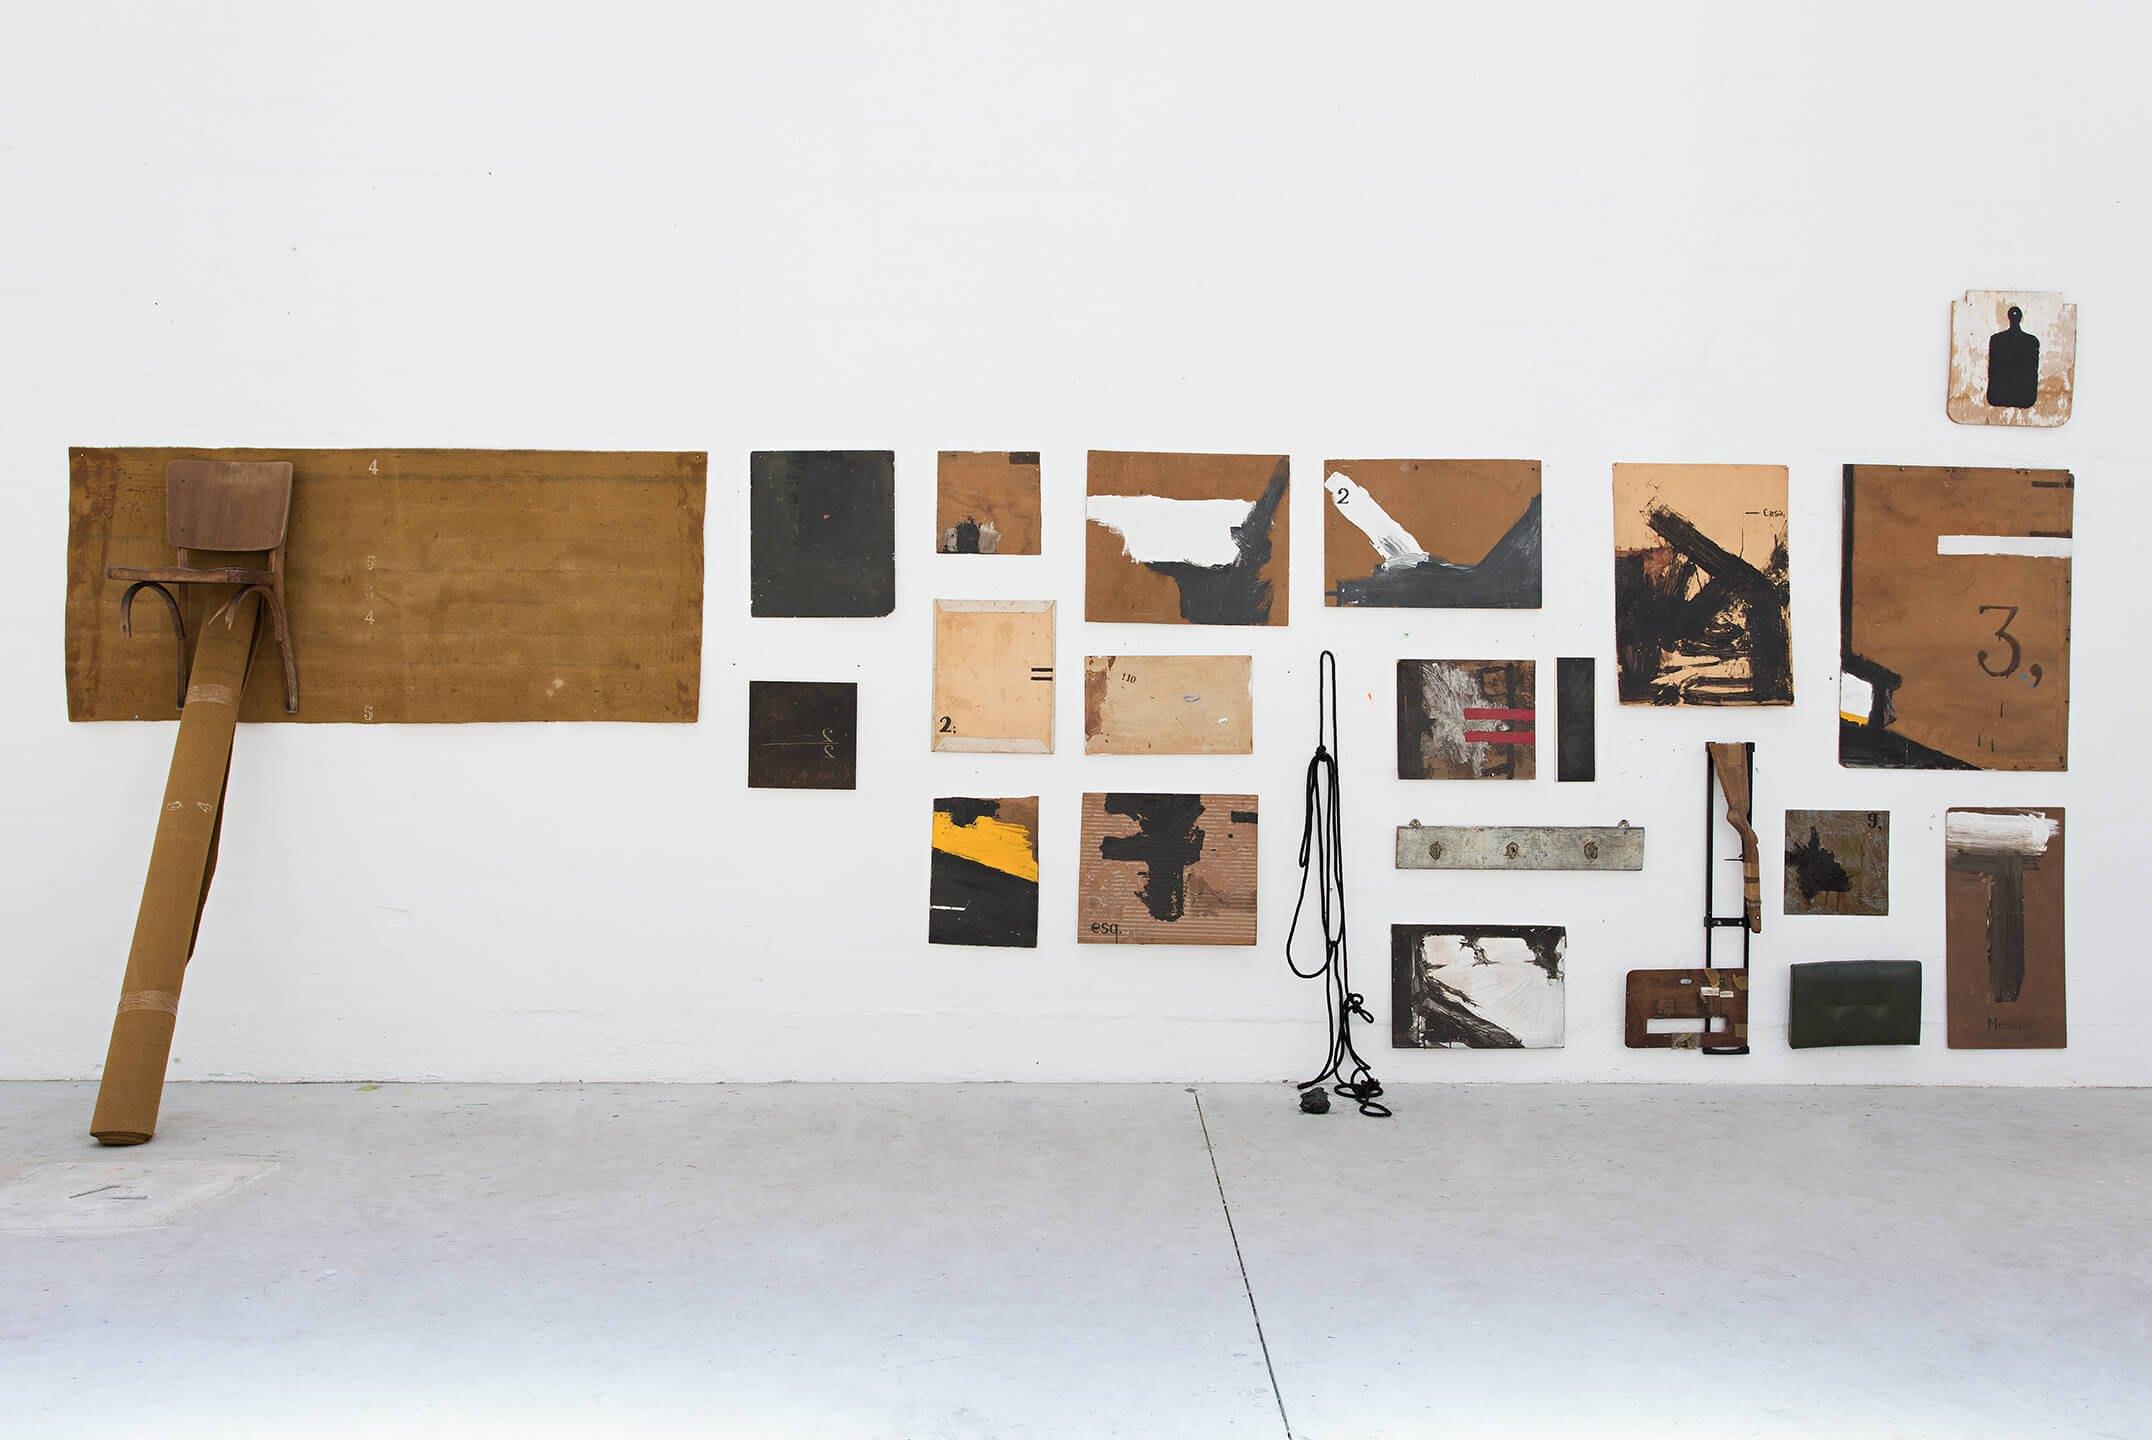 Deyson Gilbert,<em>DCVXVI</em>, 2003/2007, acylic, pitch, latex, varnish, wood, metal, obsidian, carpets, strings, linoleum, 260 × 650 × 82 cm - Mendes Wood DM